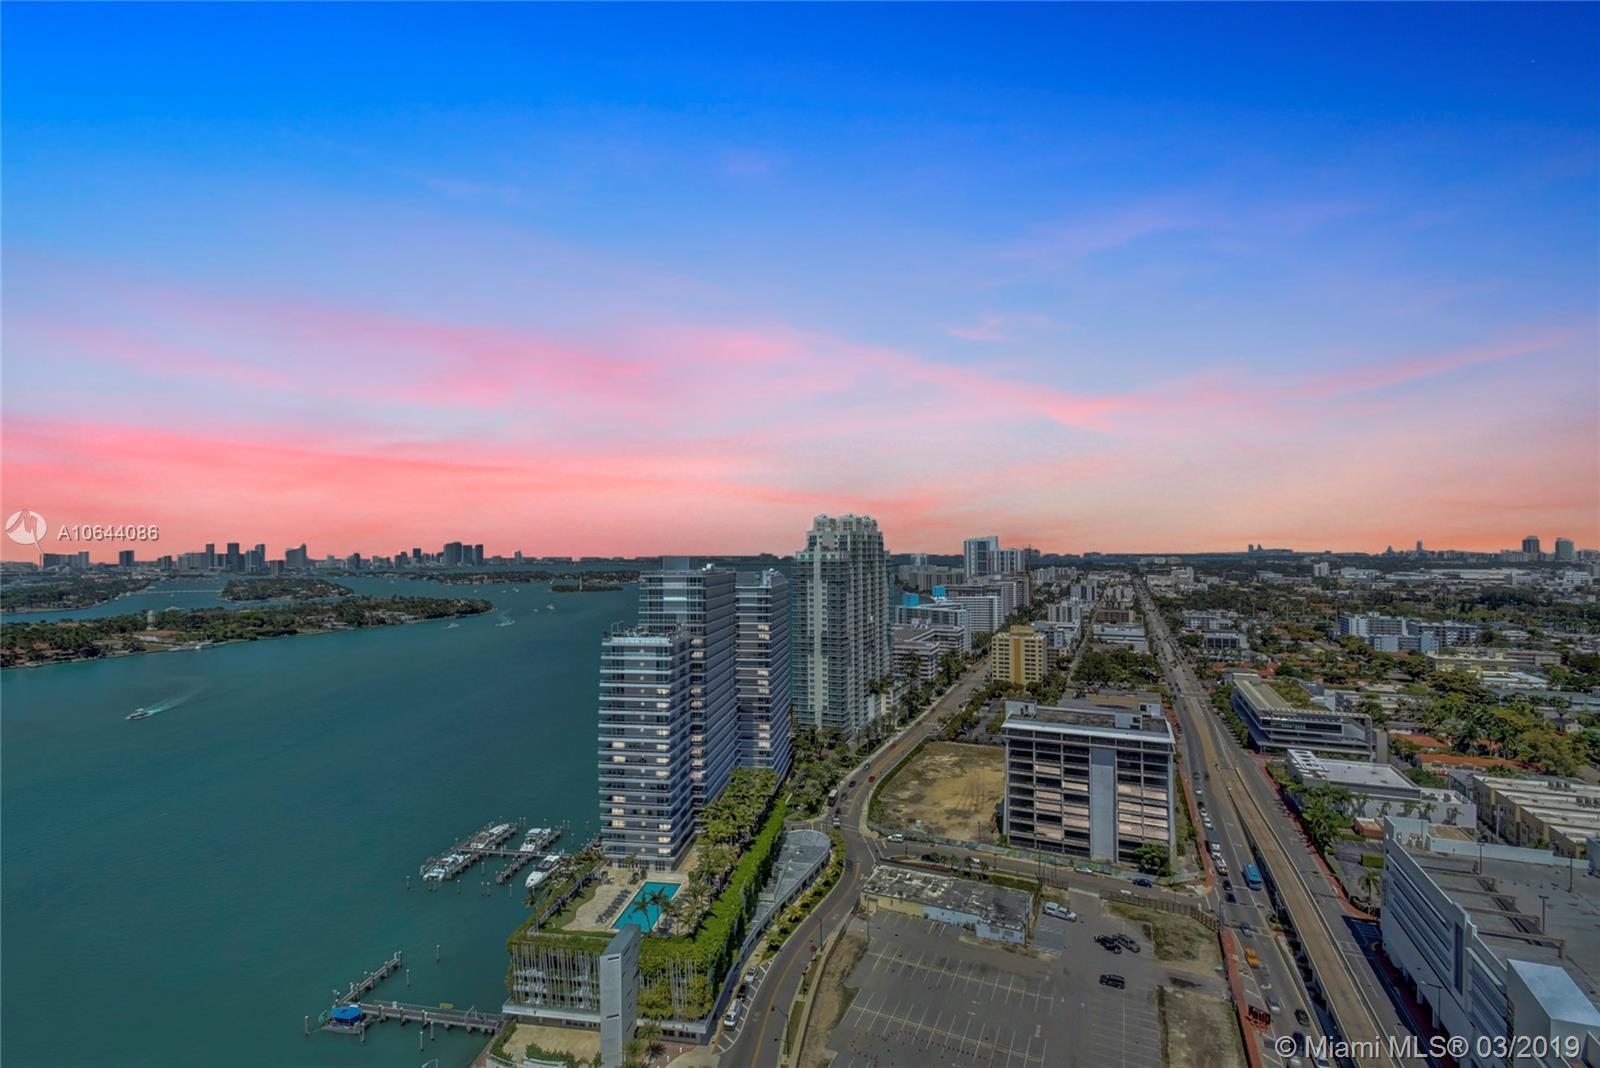 ICON South Beach image #3